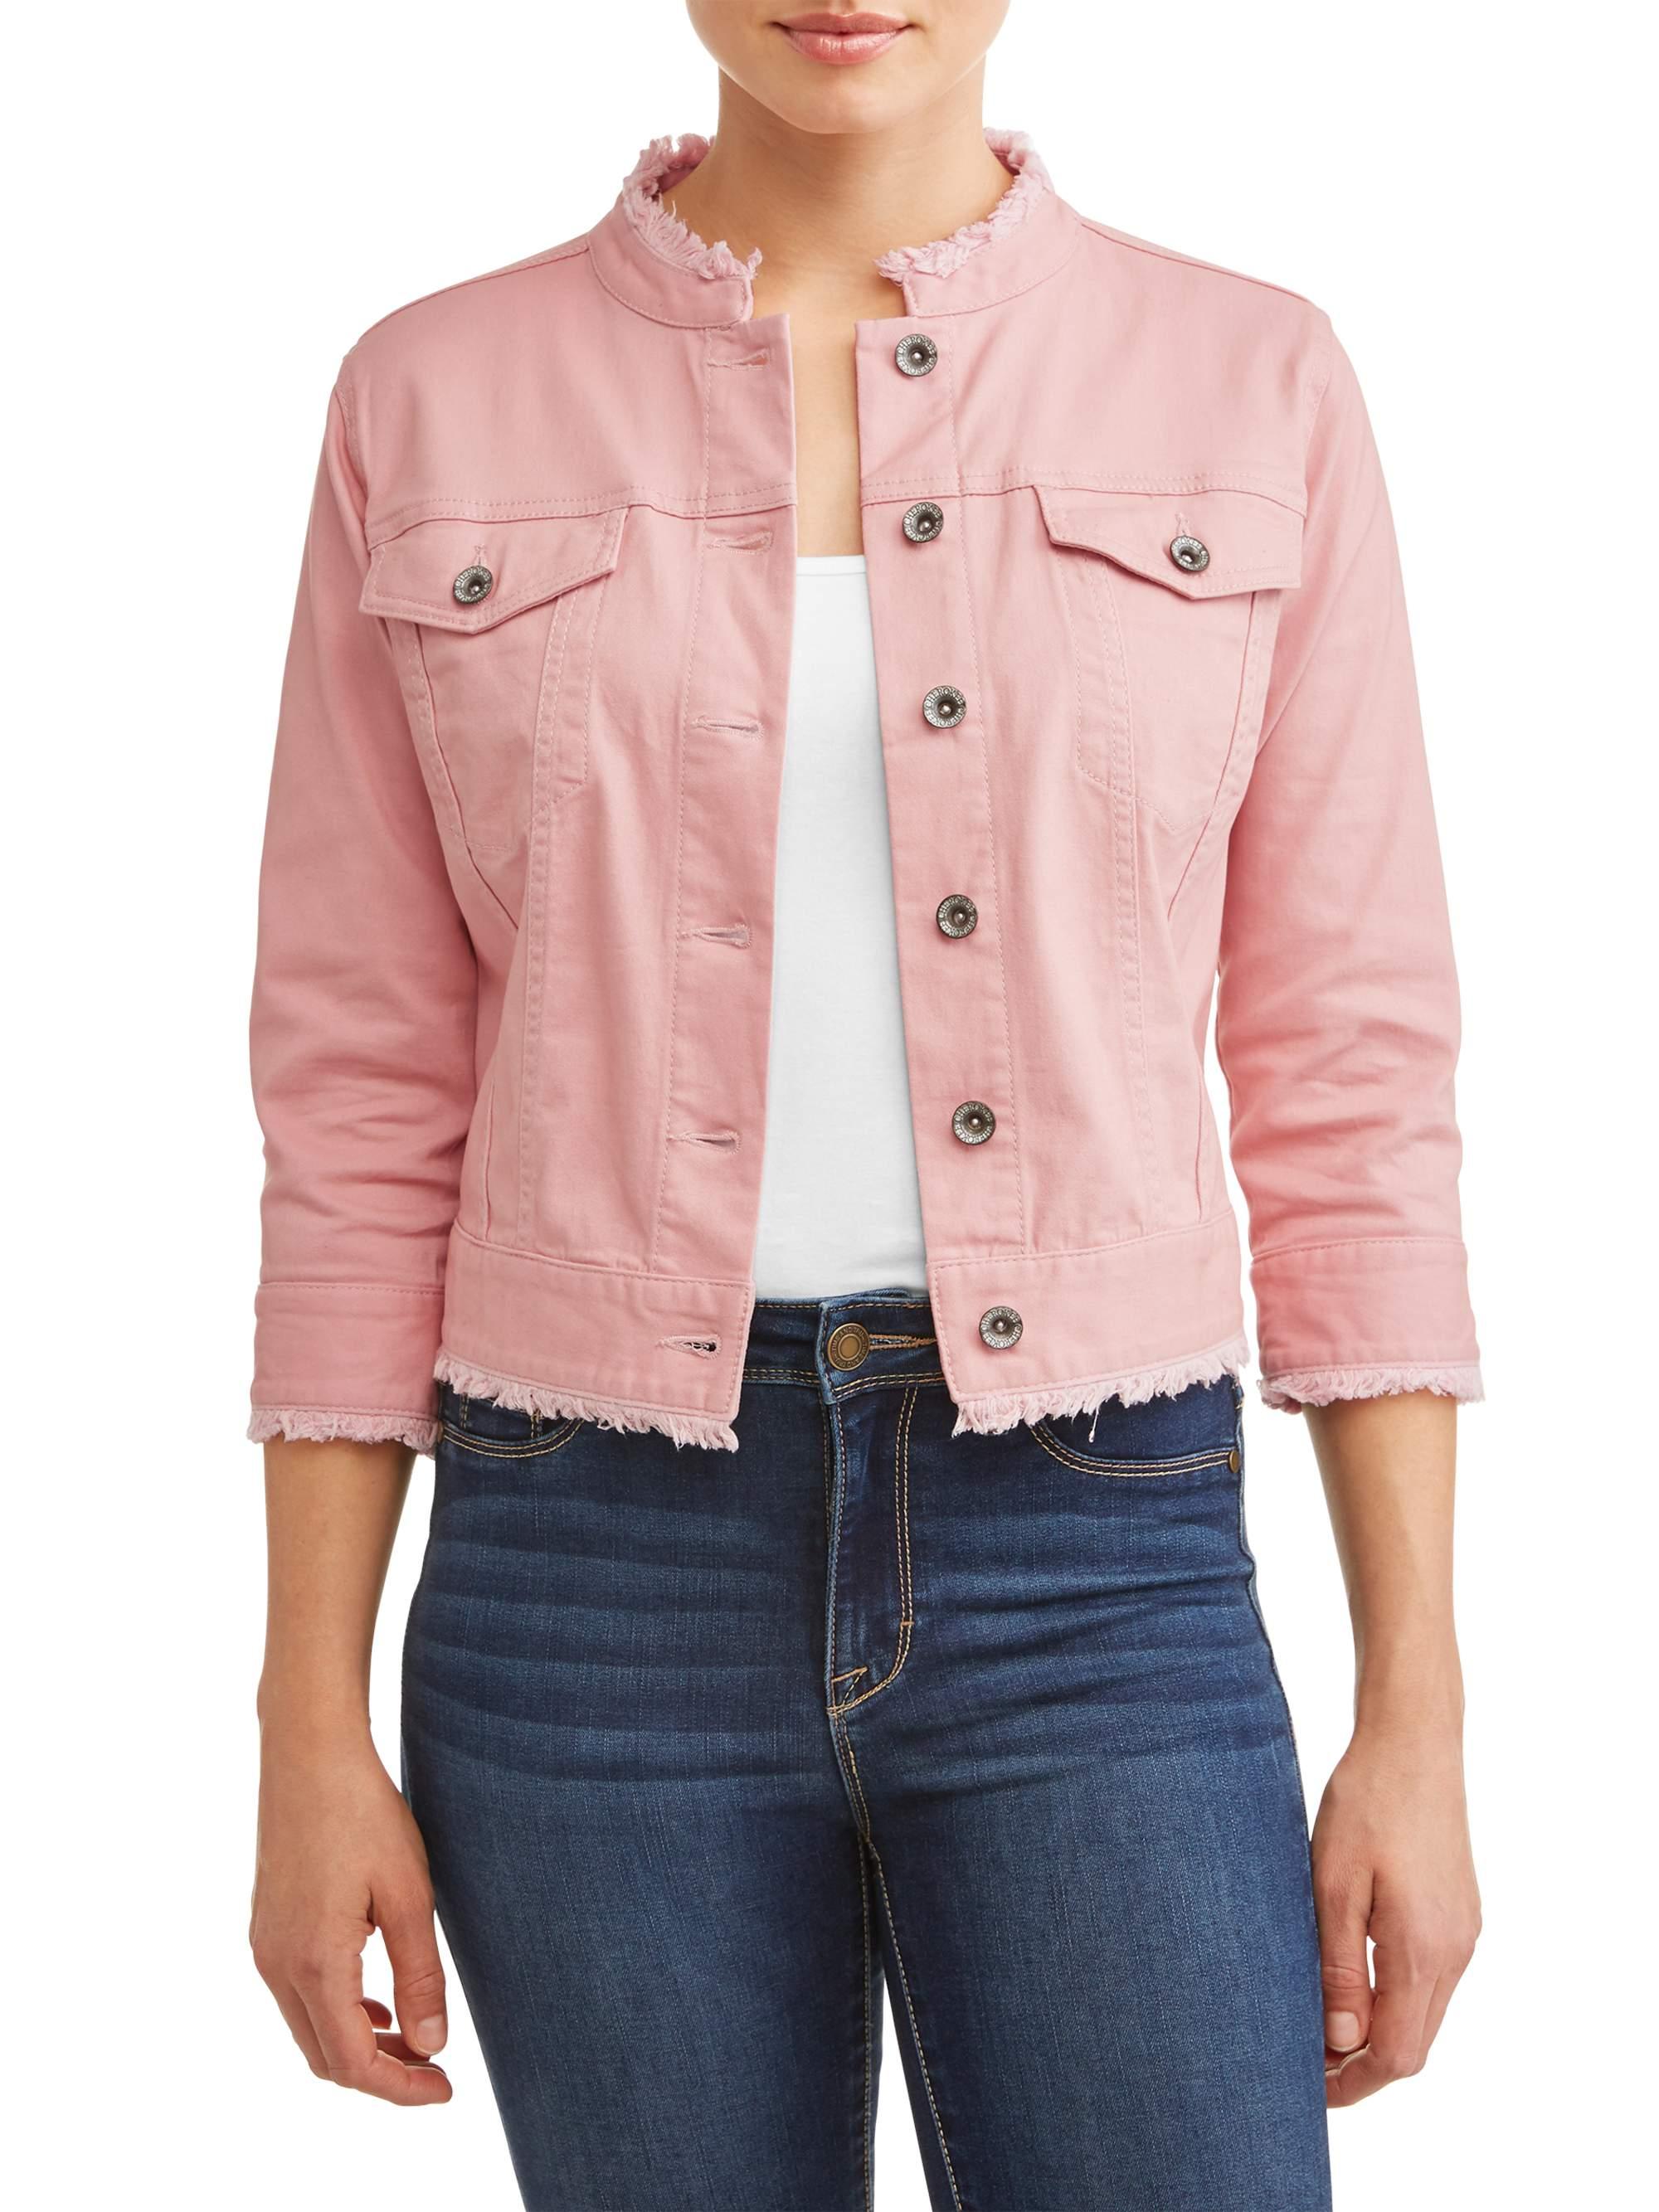 Women's Cropped Denim Jacket with Fray Hem